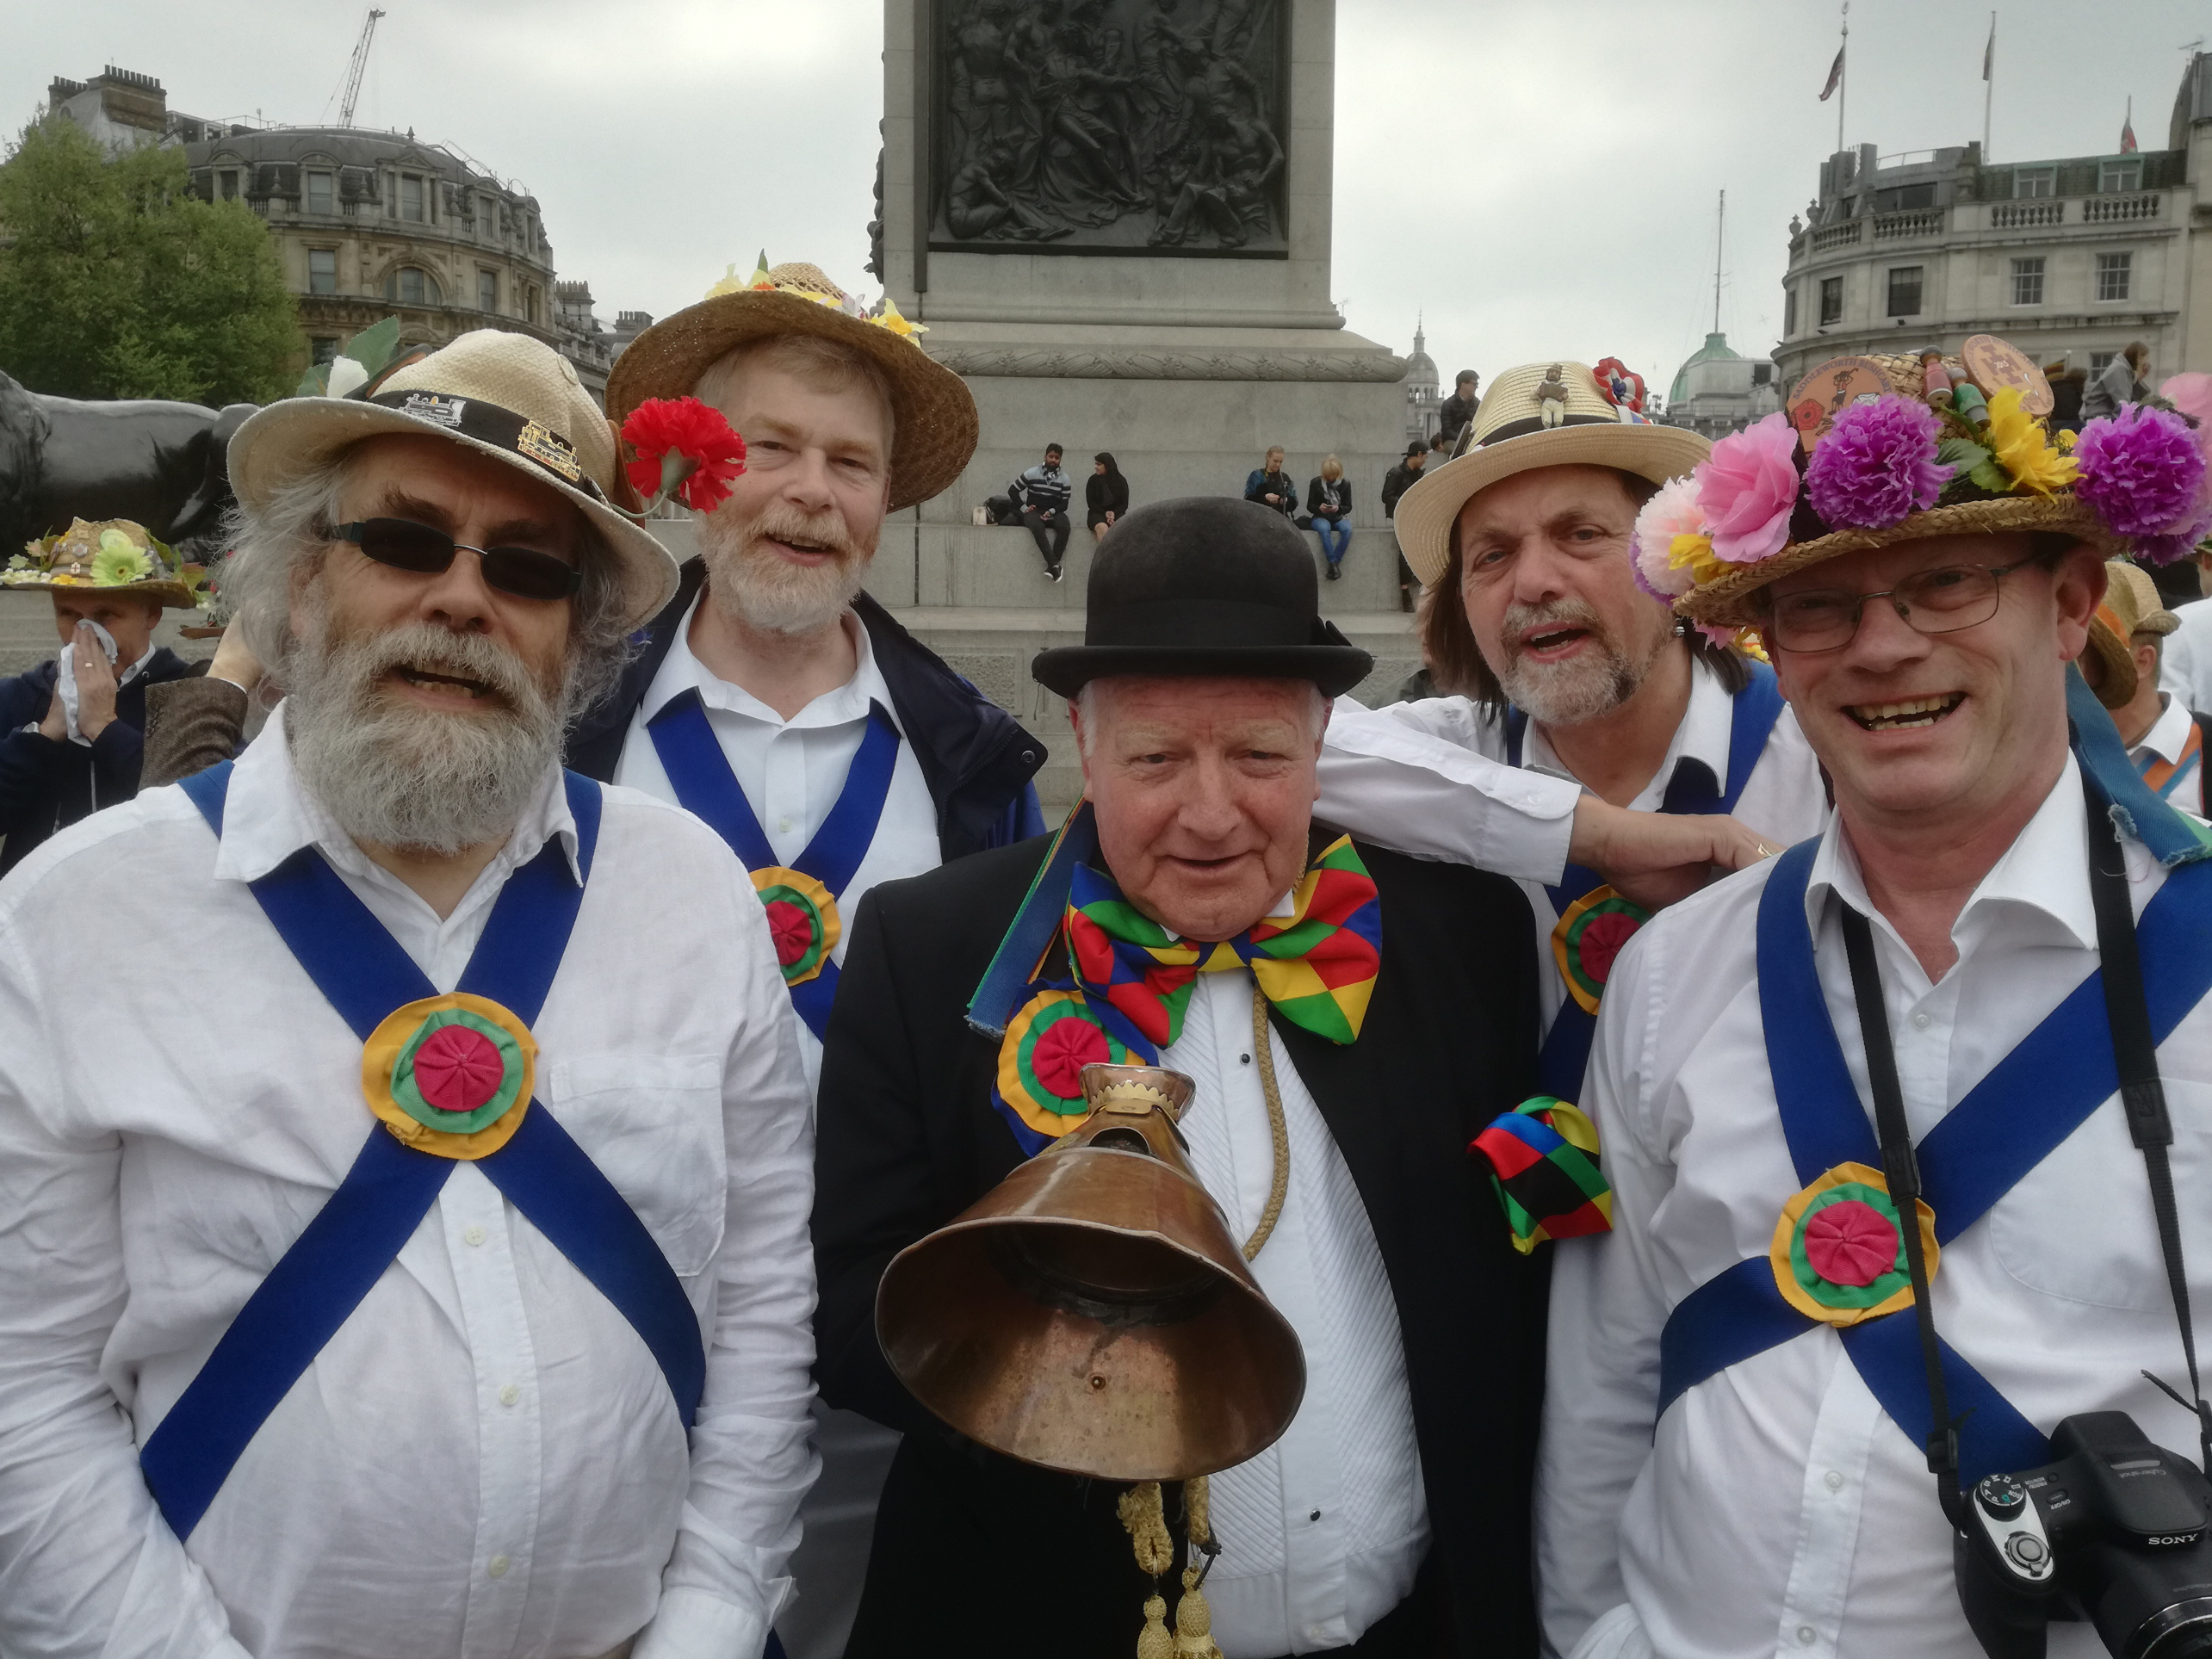 Jockey in Trafalgar Square - Westminster Day of Dance 2017